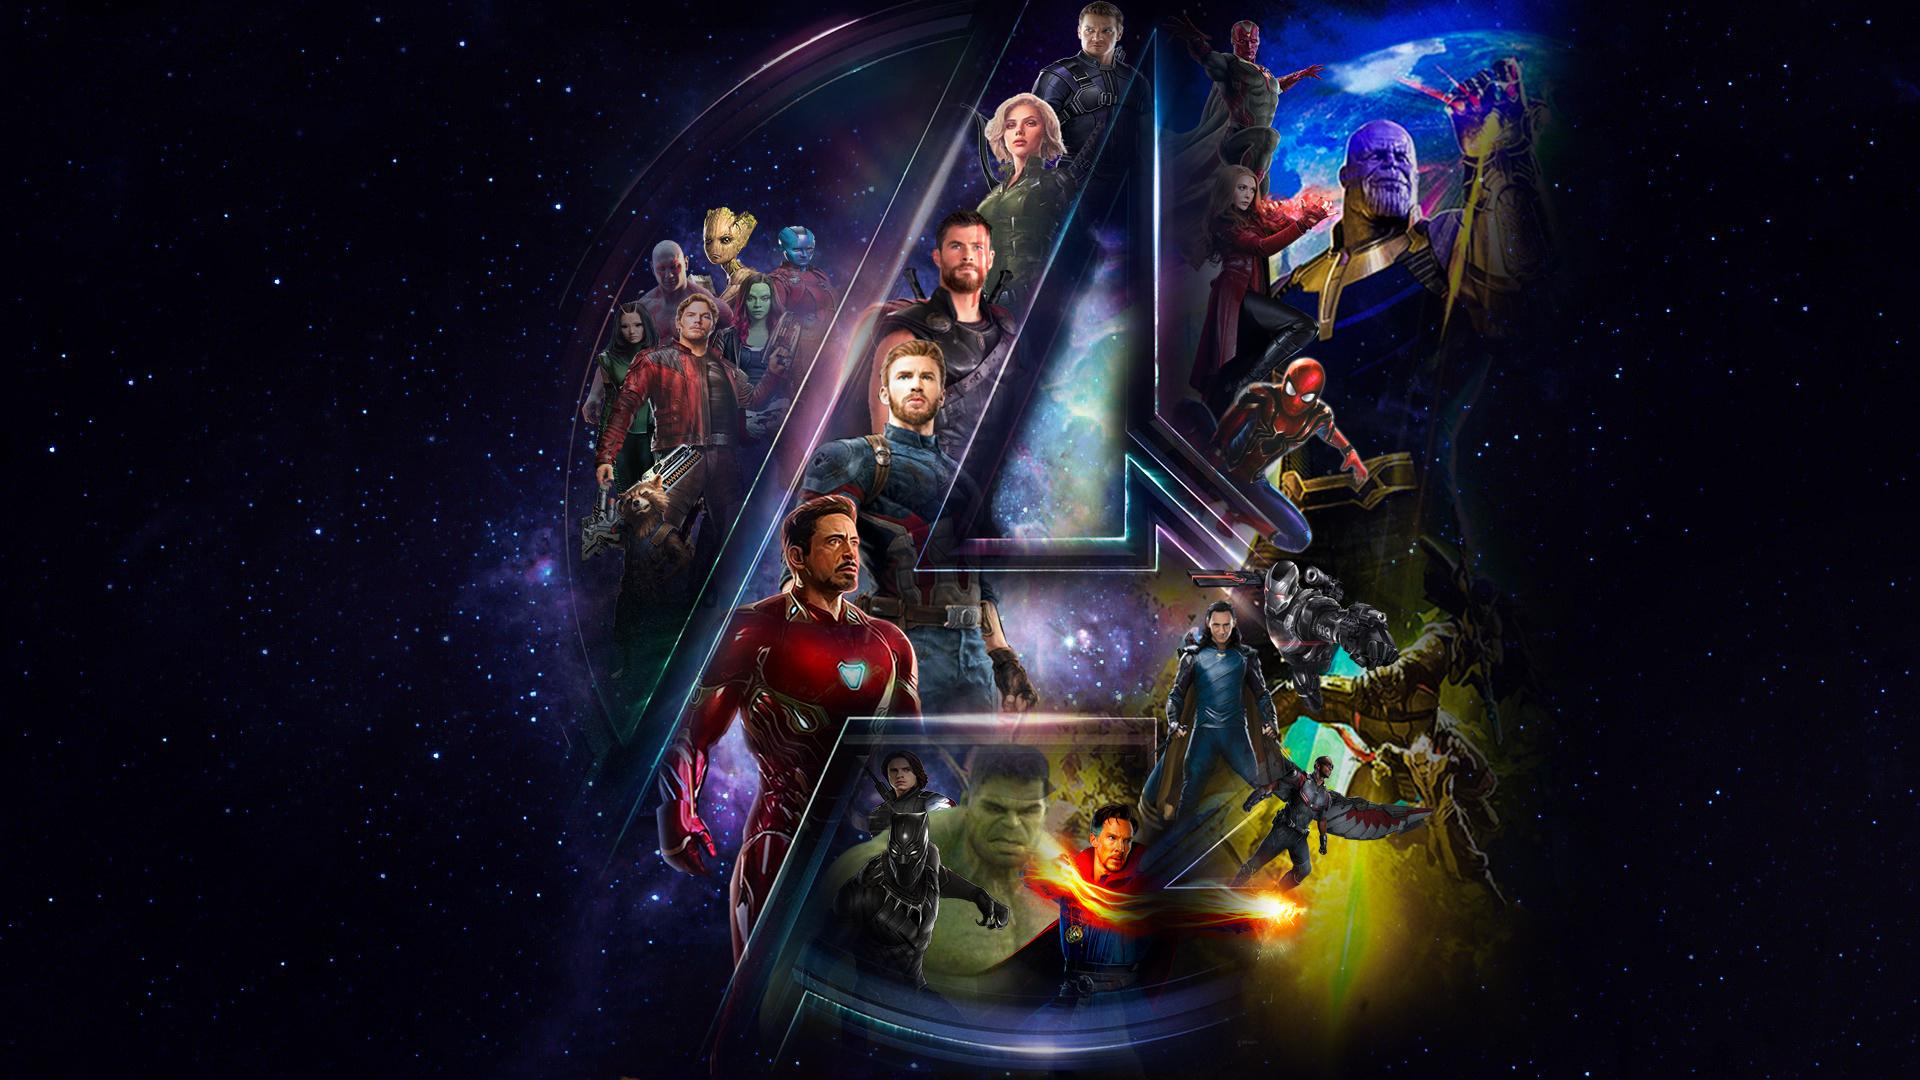 Мстители 3, Война Бесконечности, Avengers Infinity War